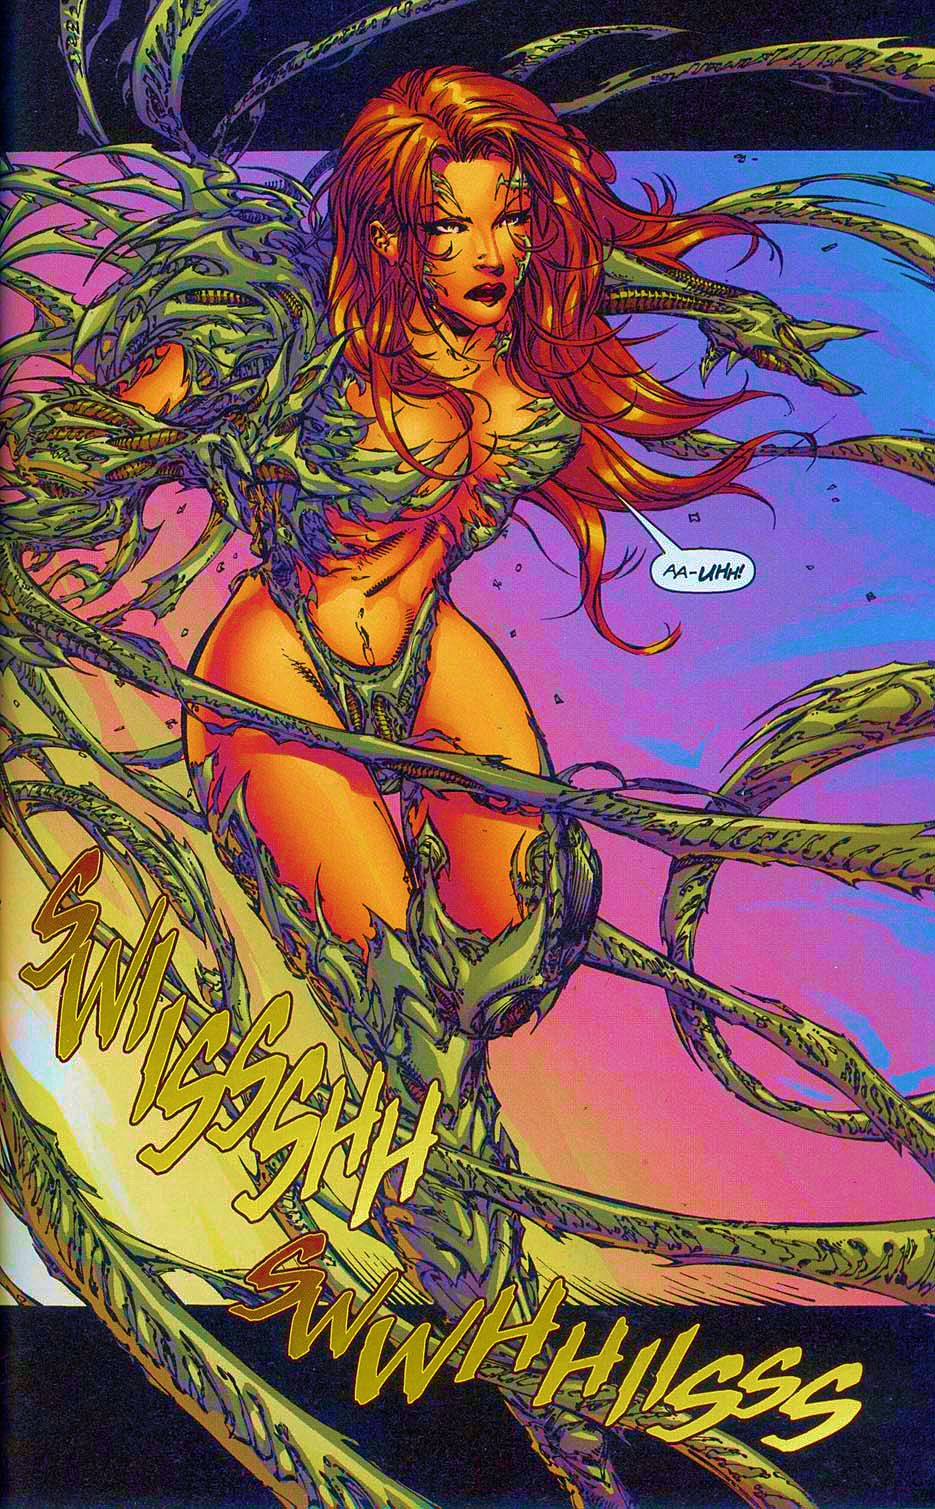 Read online Overkill: Witchblade/Aliens/Darkness/Predator comic -  Issue #2 - 10